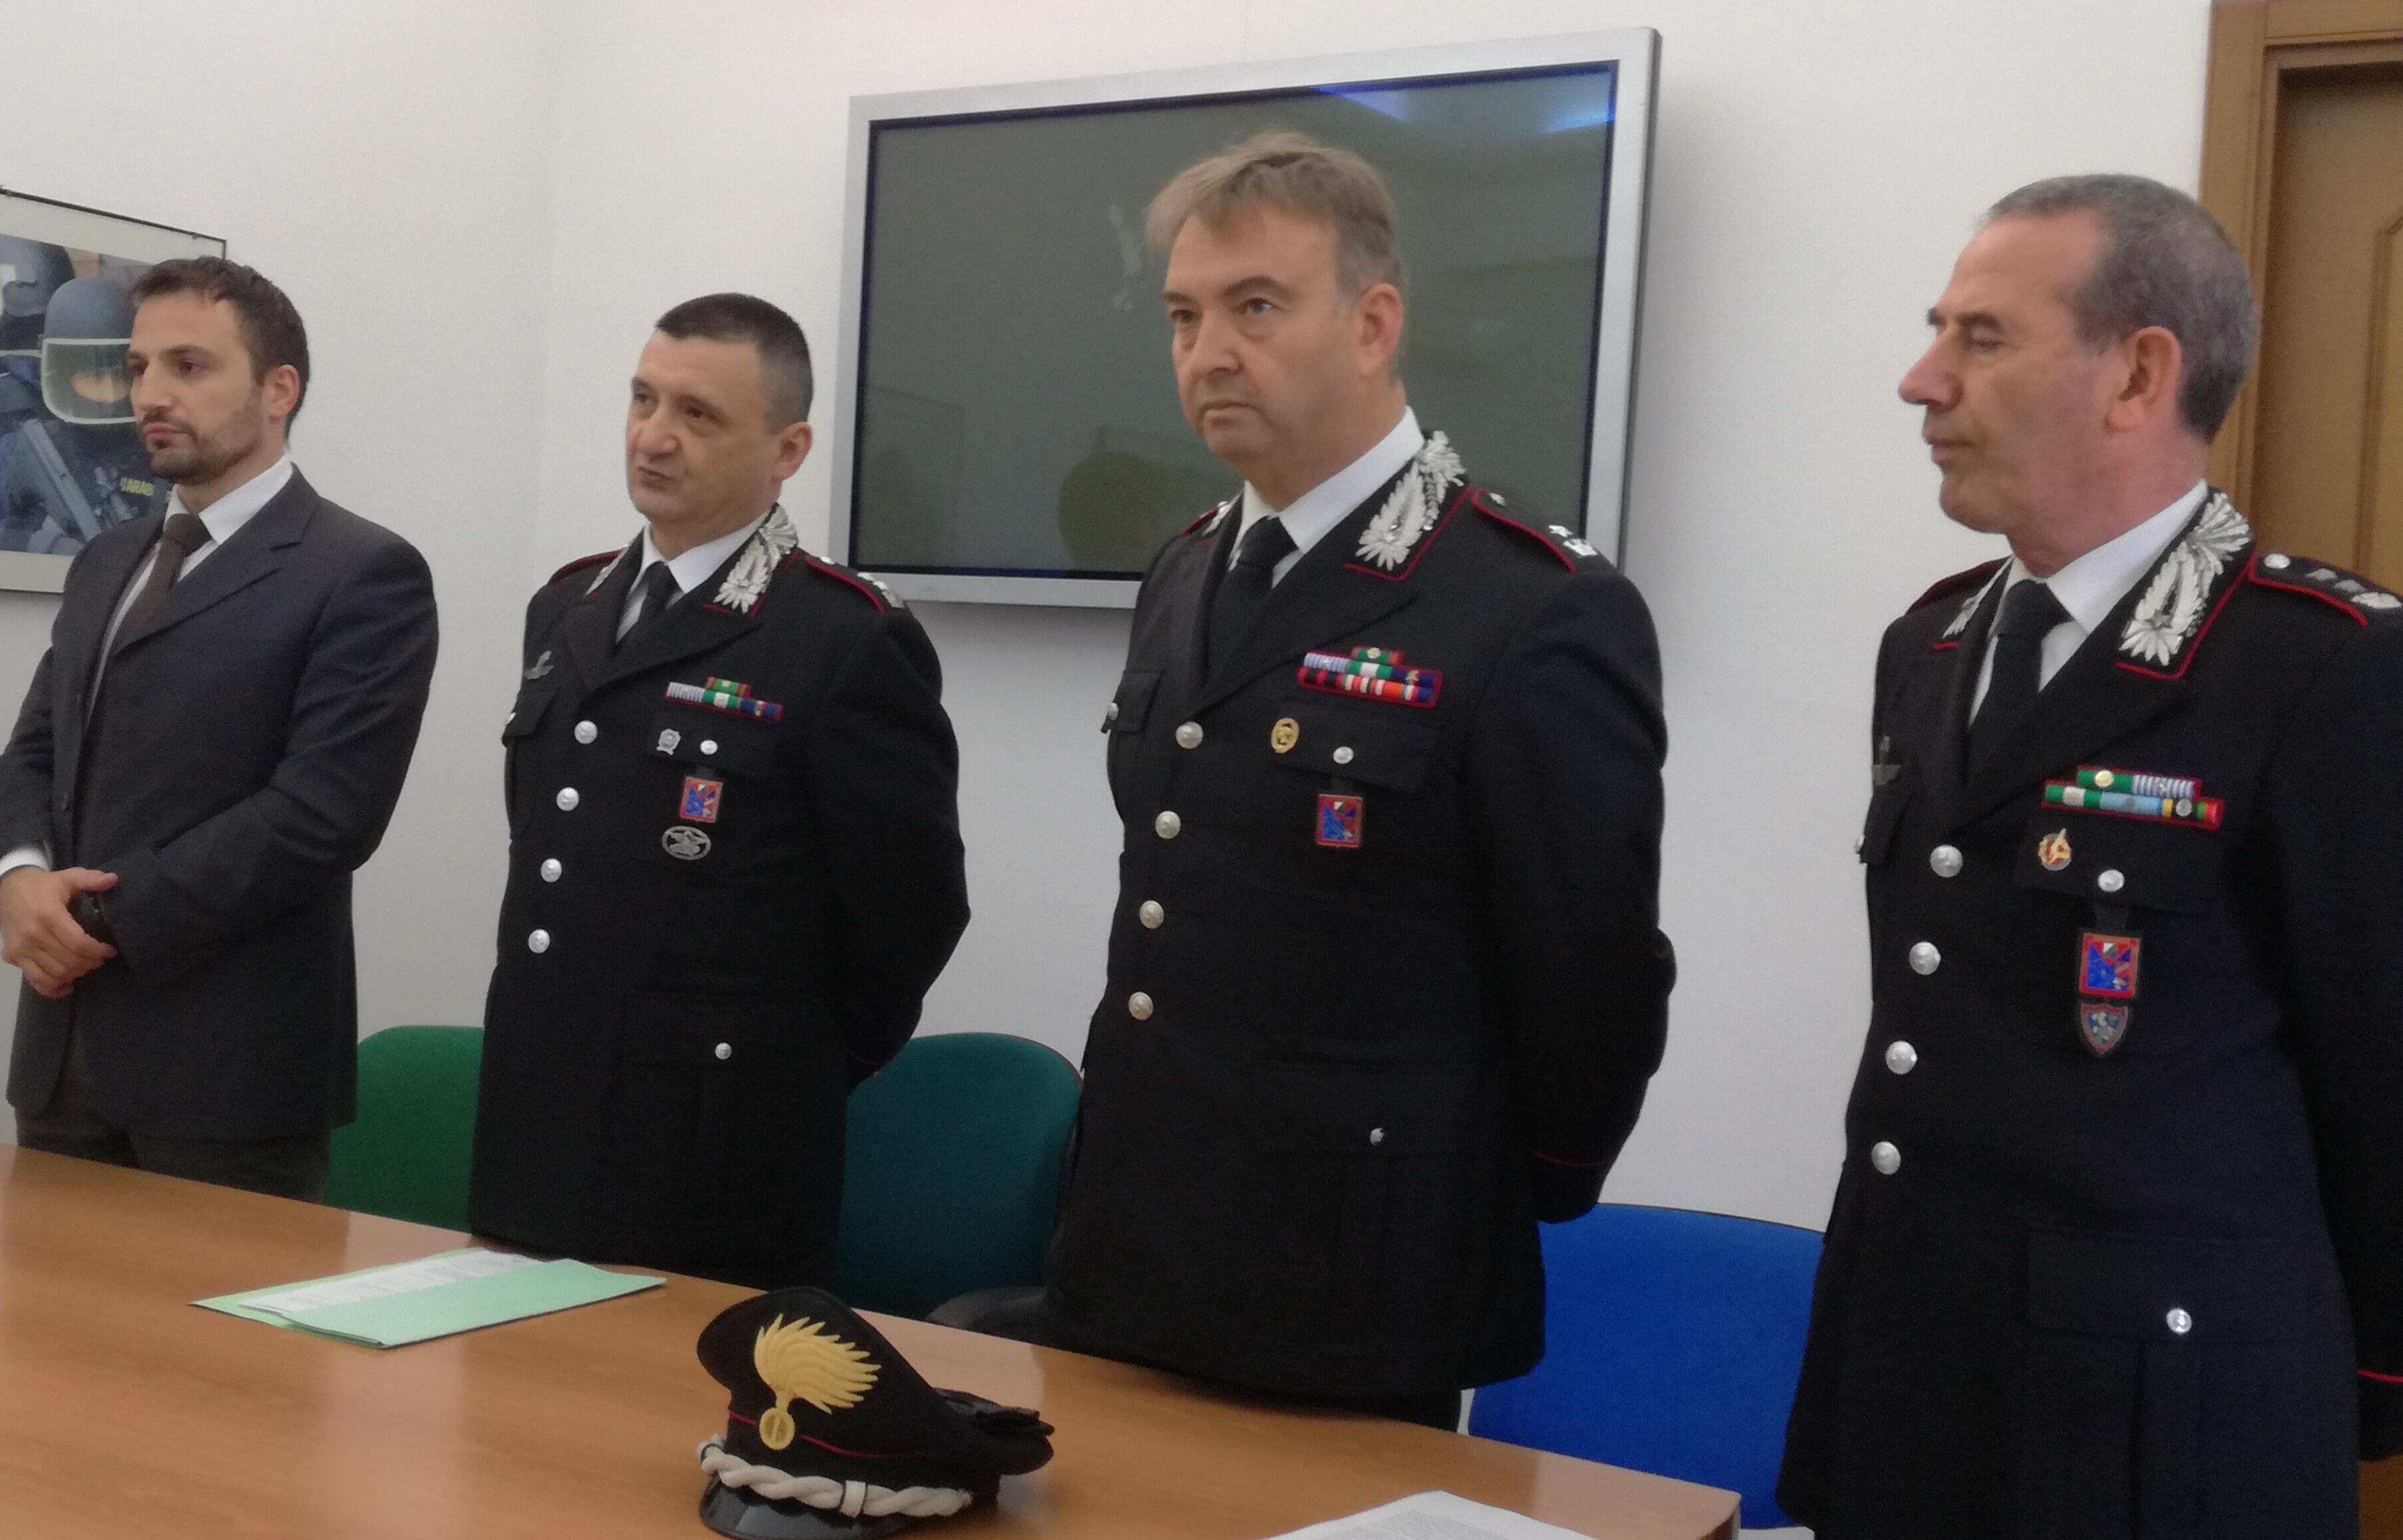 Tafferugli in Francavilla-L'Aquila: arresti salgono a 12